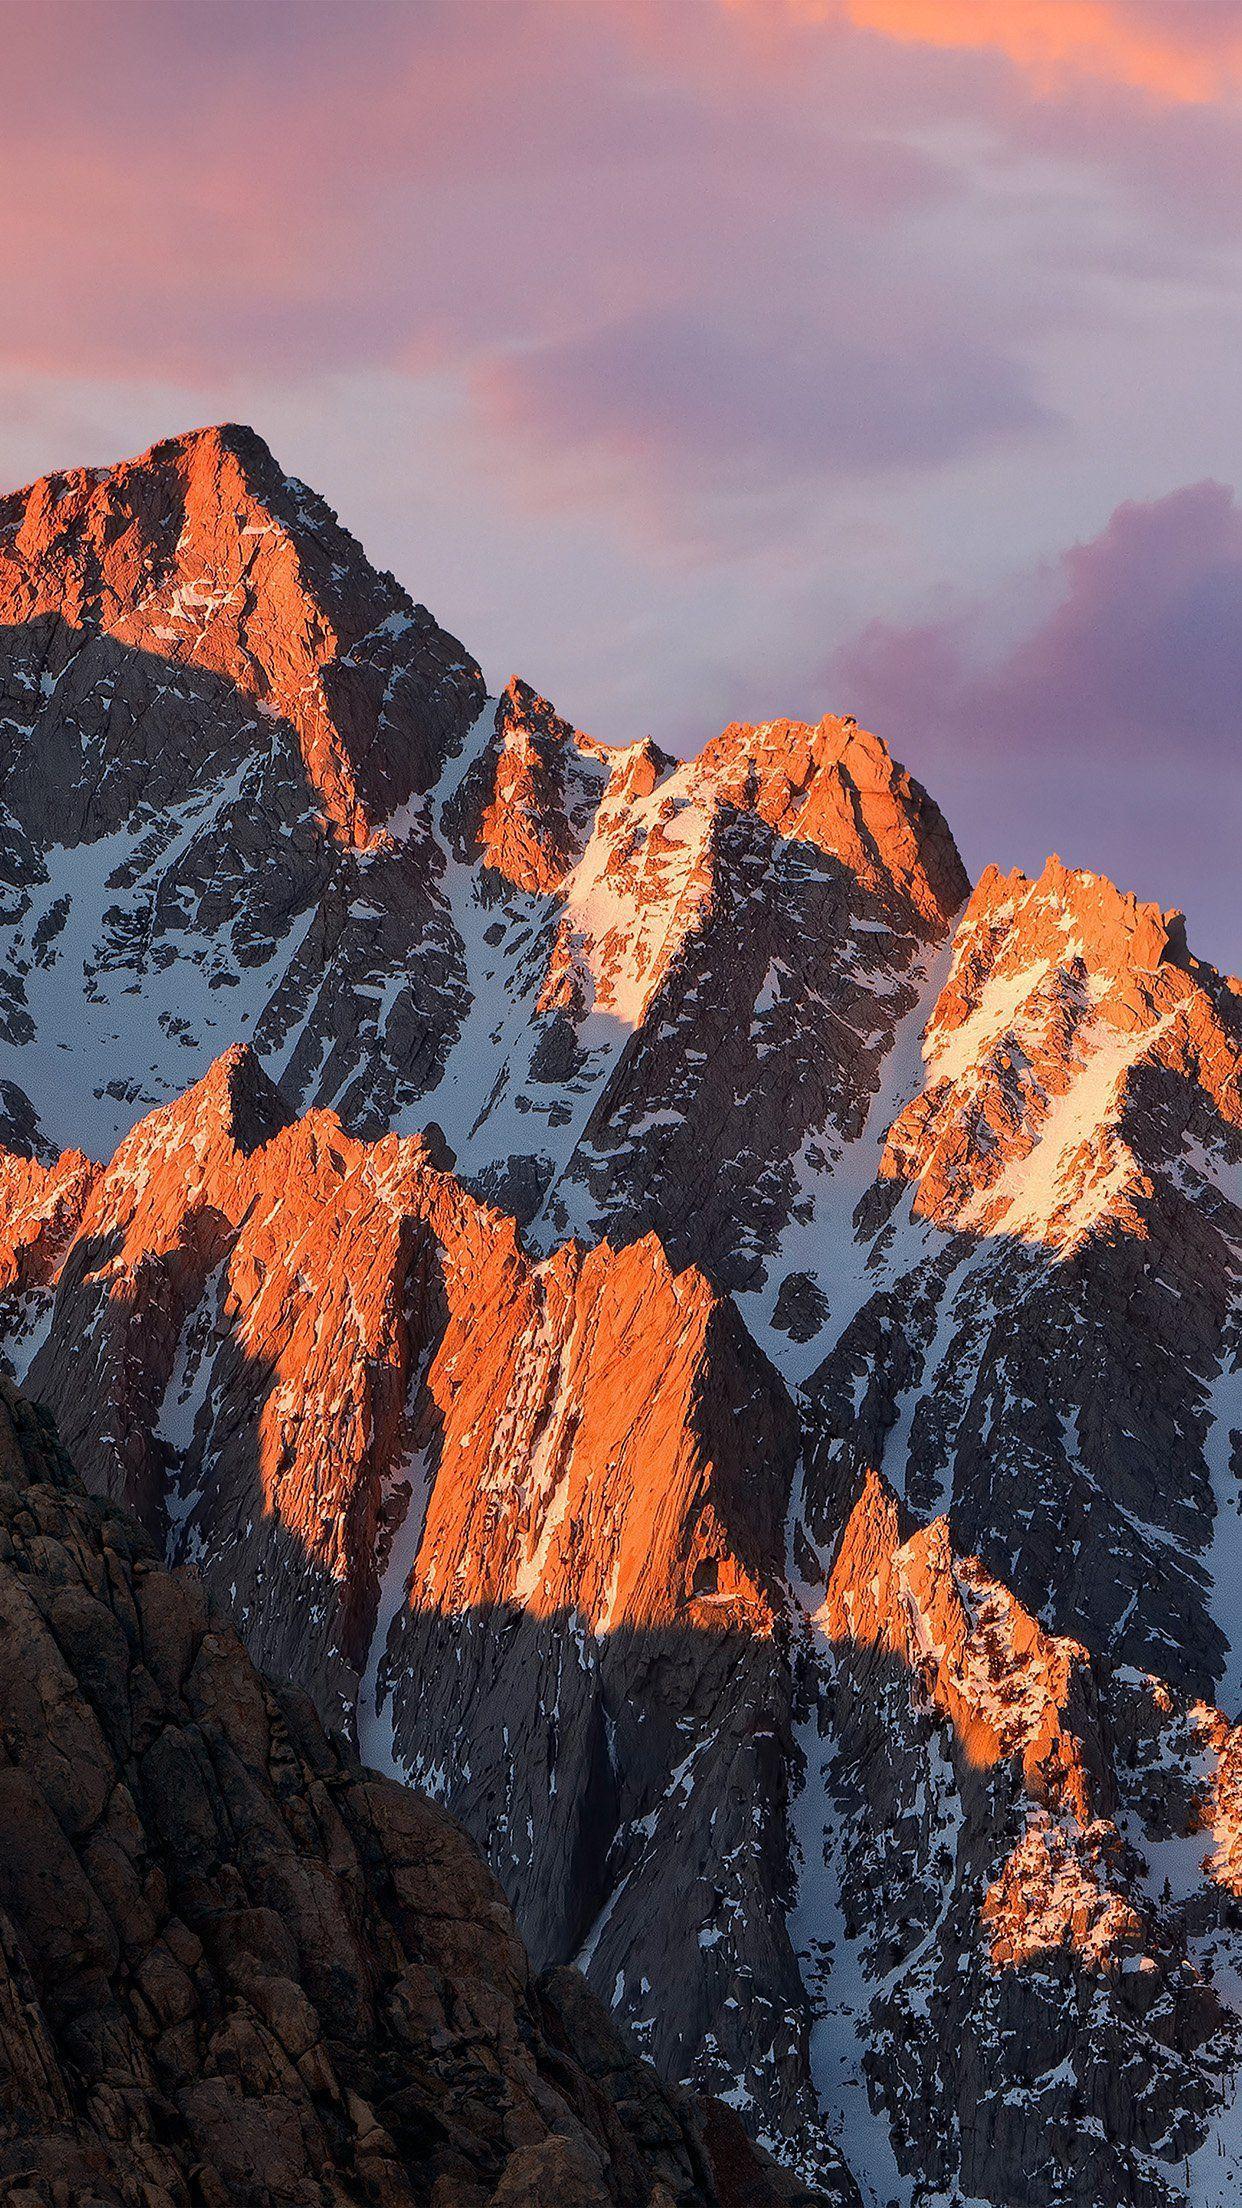 Sierra Mac Os X Wallpapers Top Free Sierra Mac Os X